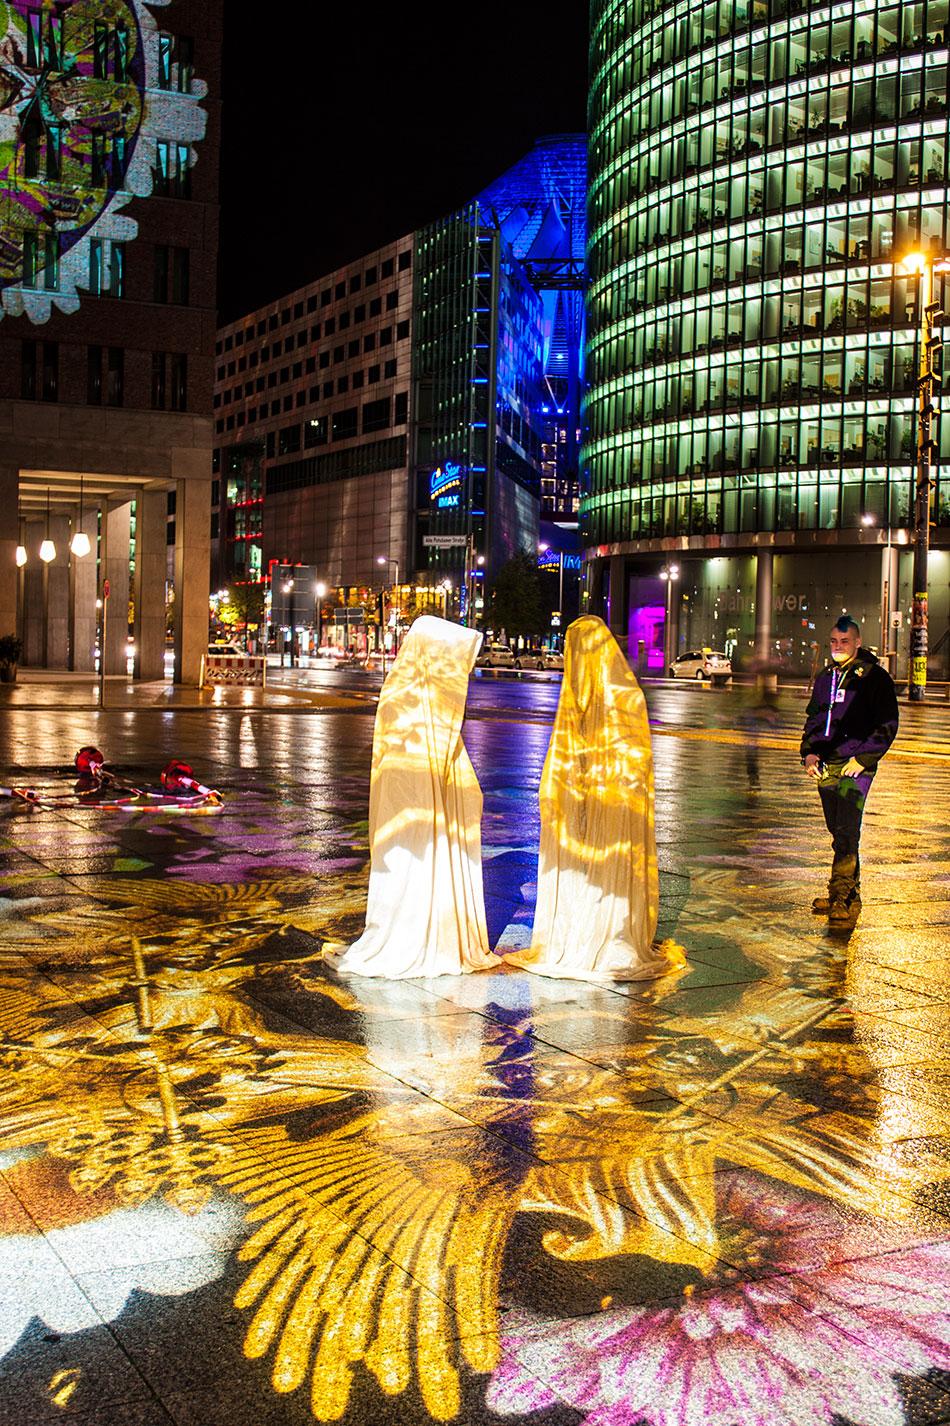 festival-of-lights-berlin-light-art-festival-contemporary-fine-art-design-show-large-scale-sculpture-guardiansof-time-manfred-kili-kielnhofer-sculpture-3877